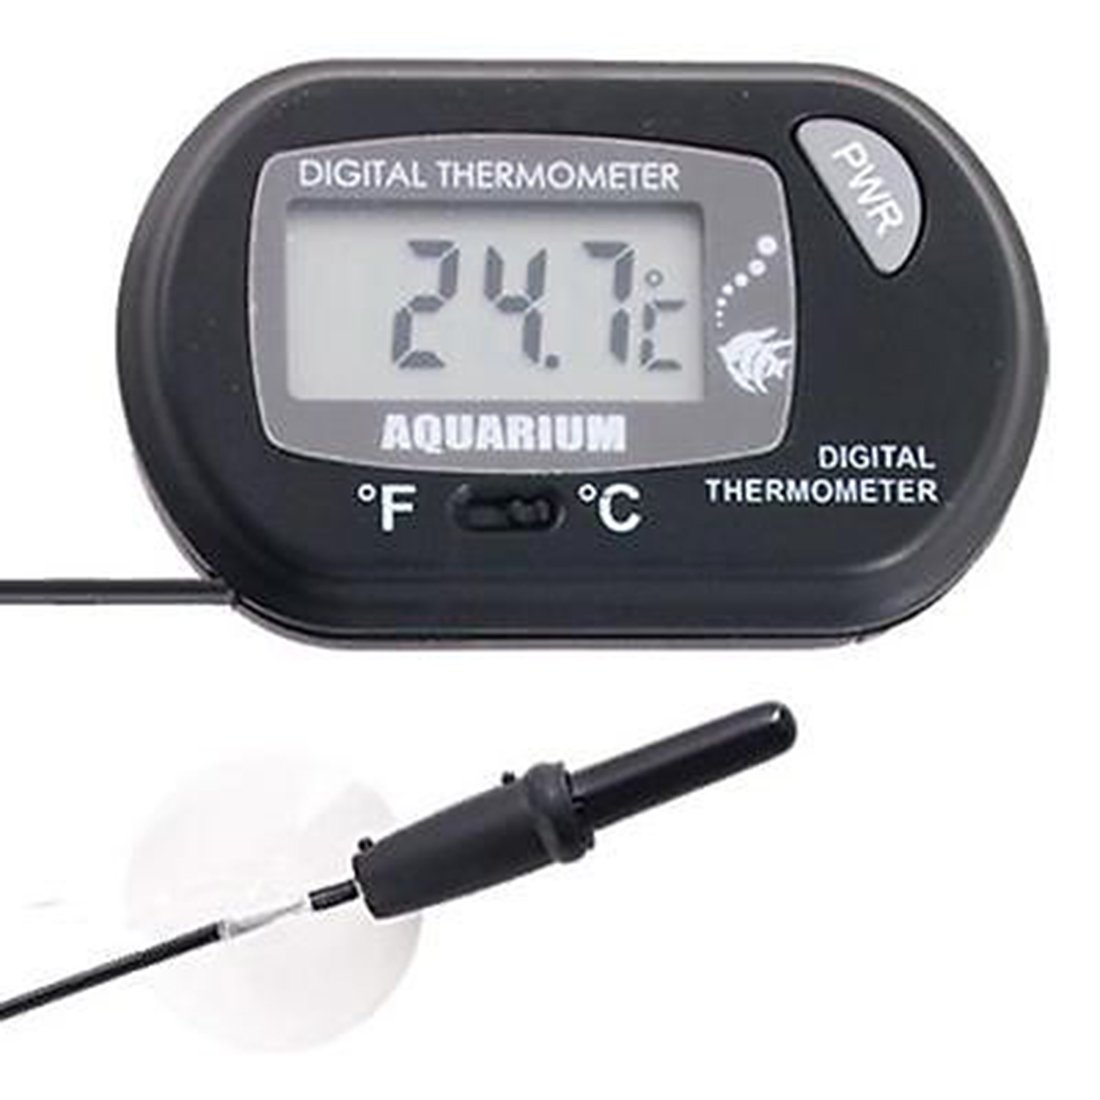 Black Measuring Aquarium LCD Digital Fish Tank Thermometer Temperature Meter MR.JIANG RayMALL0728